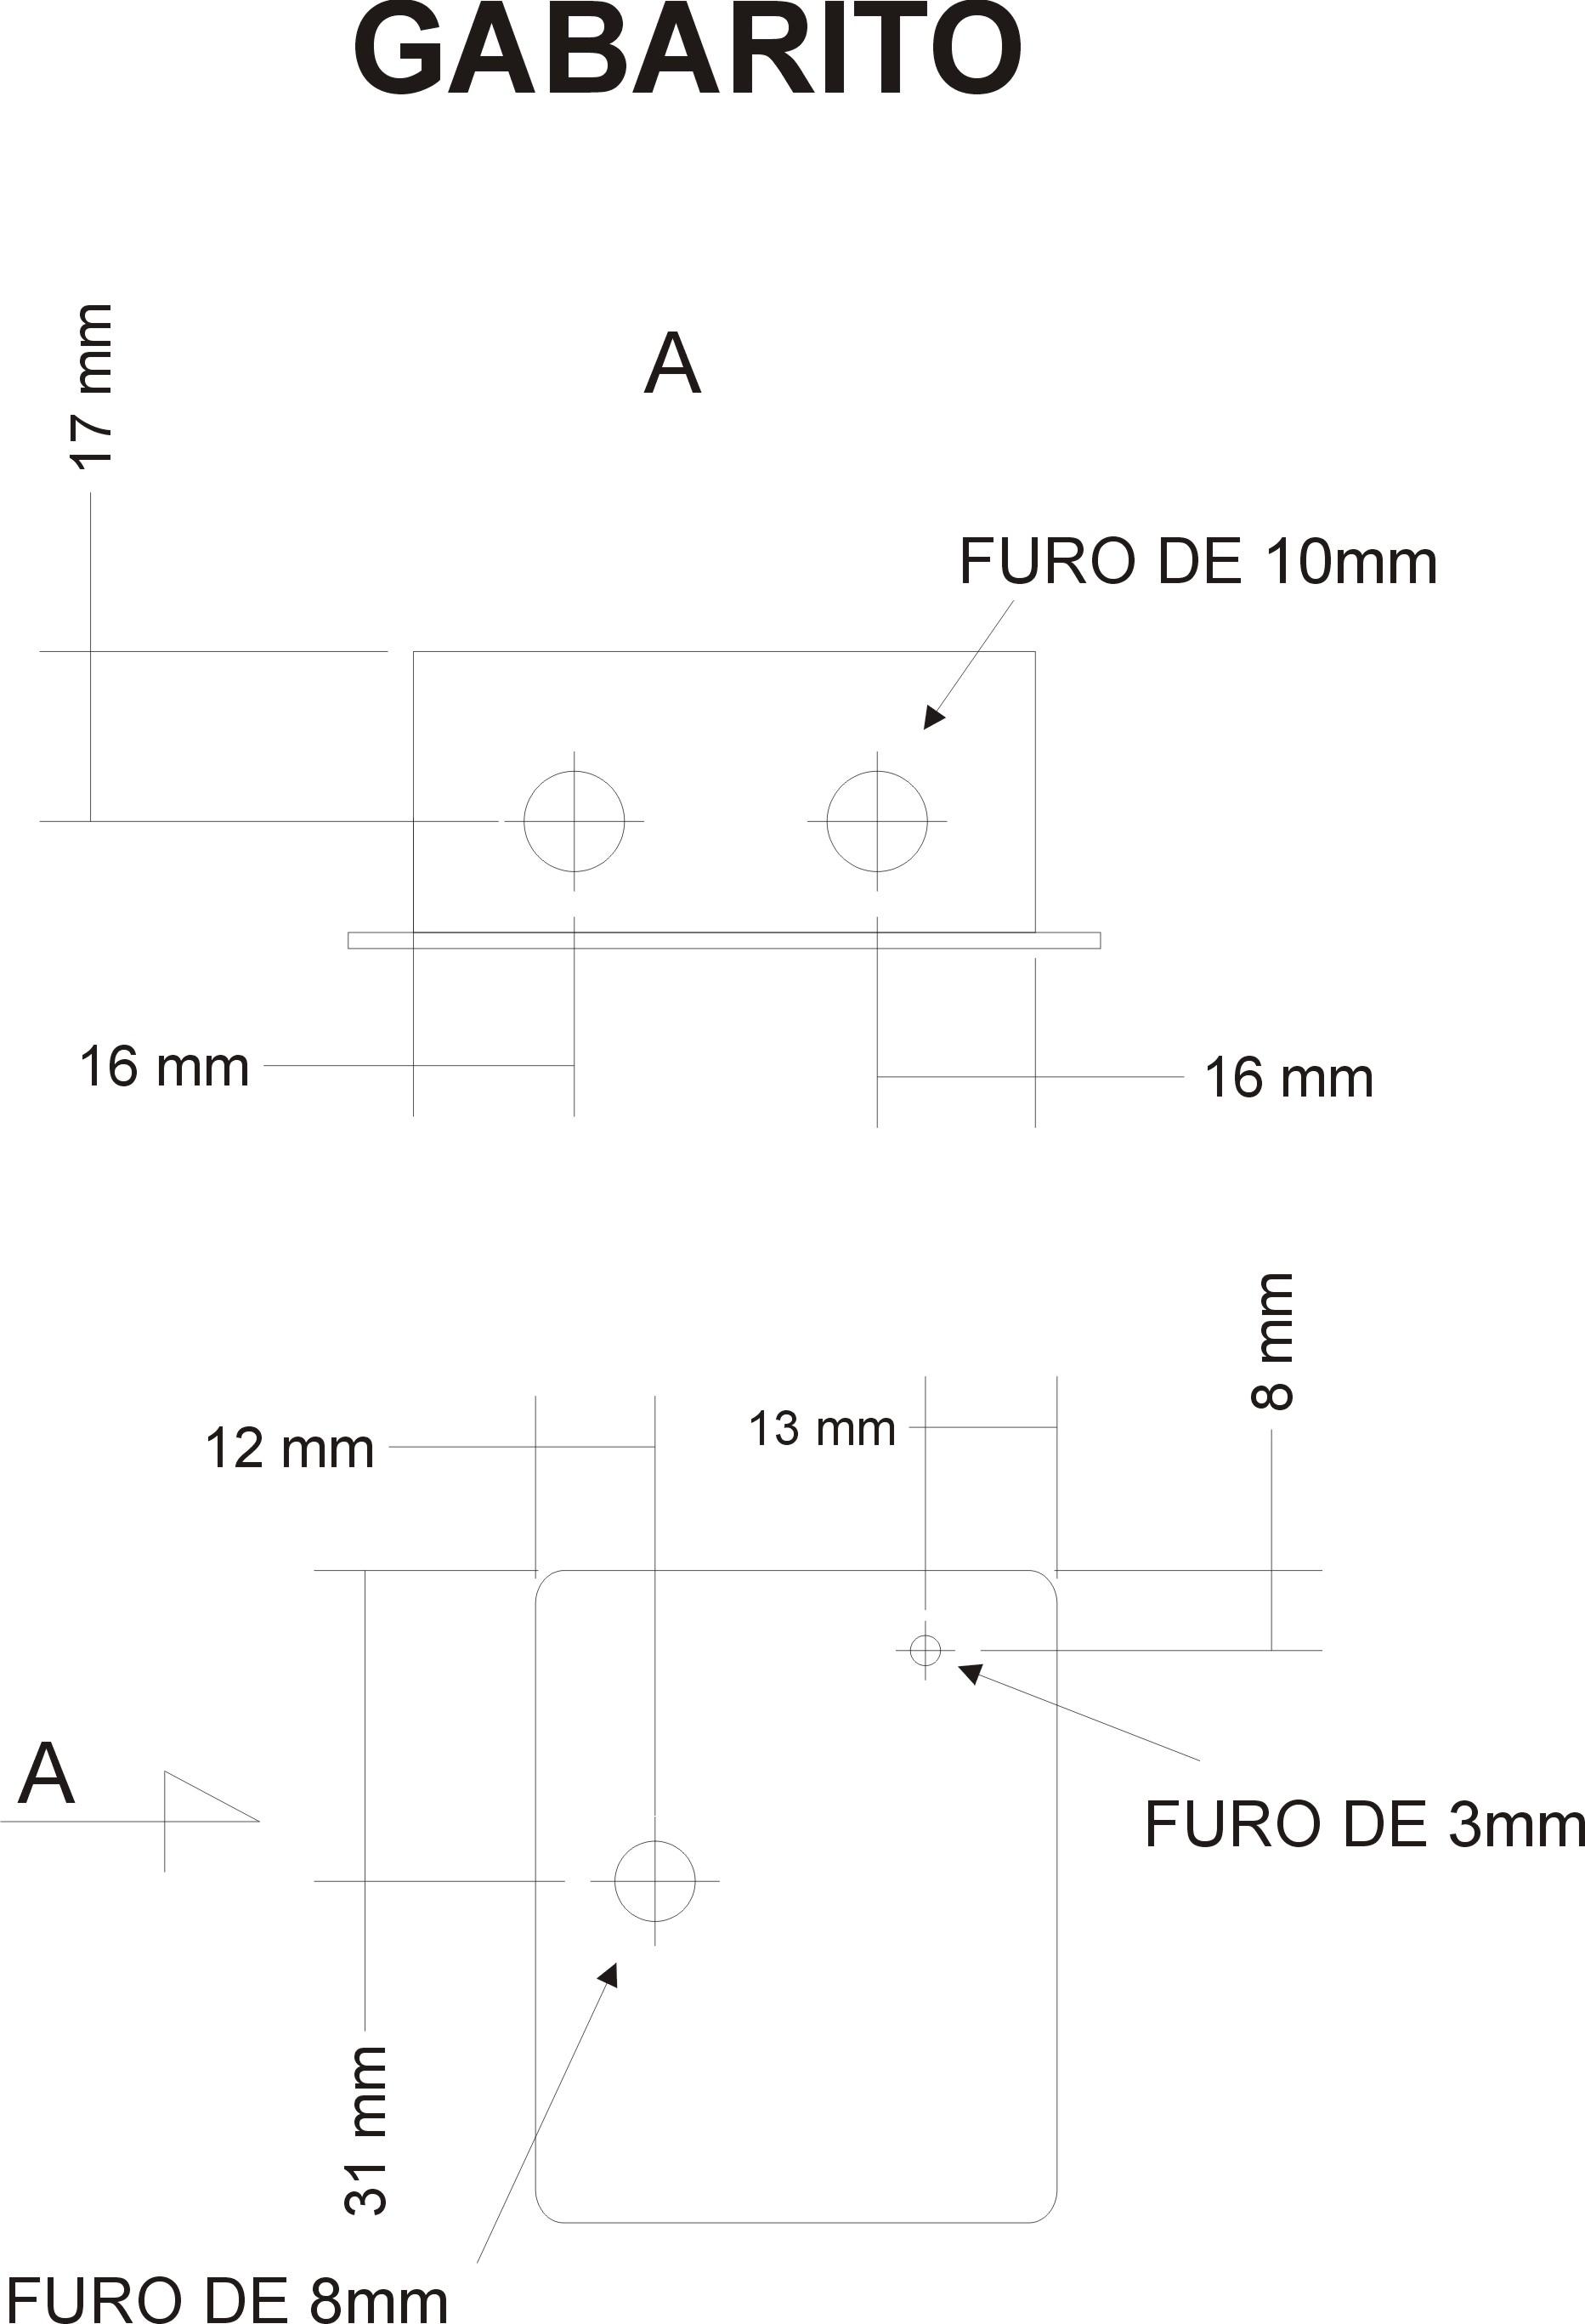 Gabarito de Furo Cable Tester